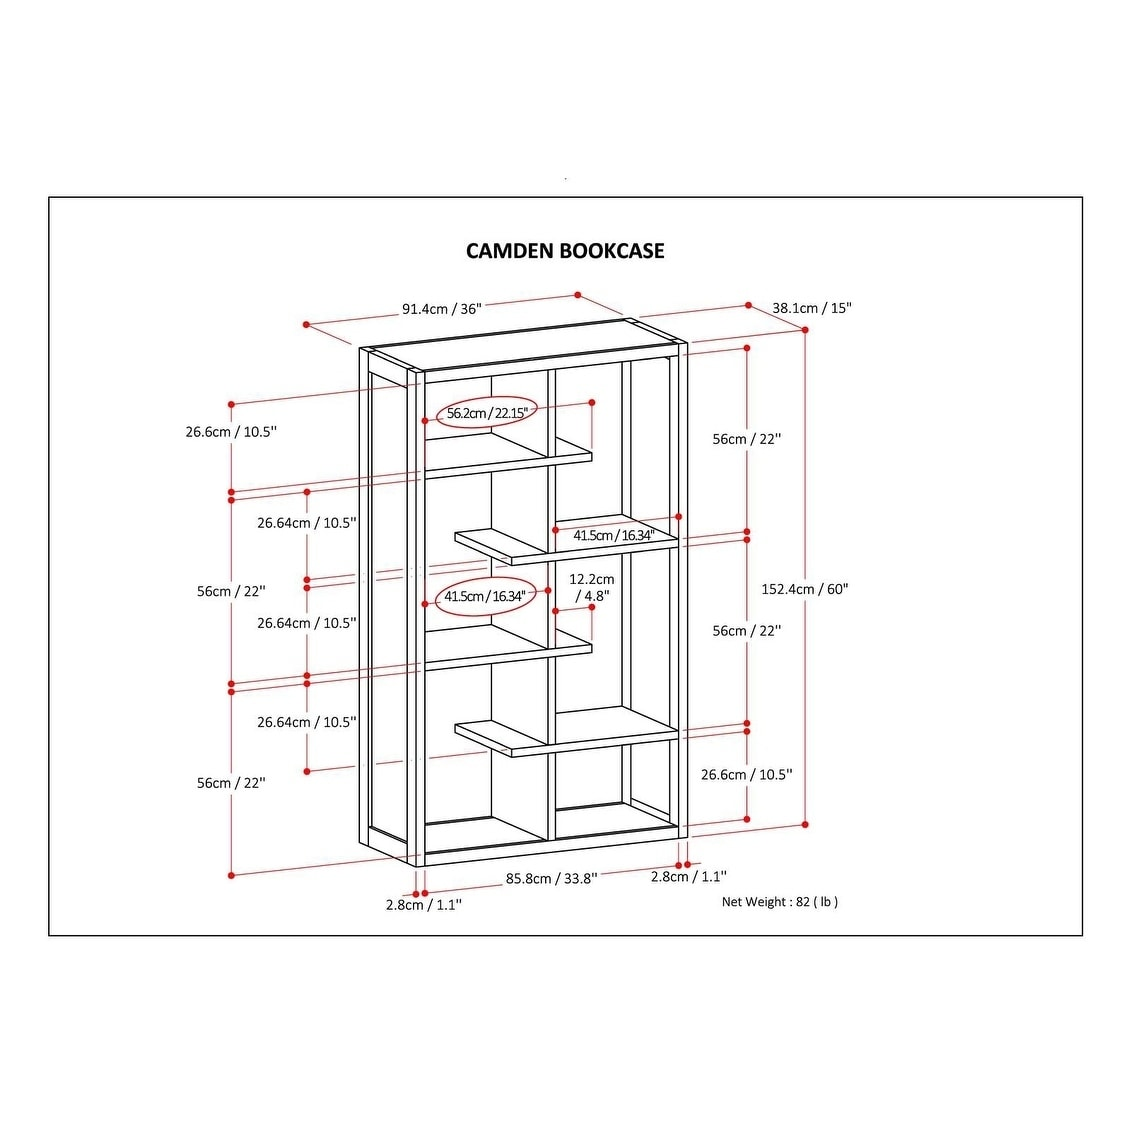 Kenwood Kvt 512 Wiring Colors Diagram